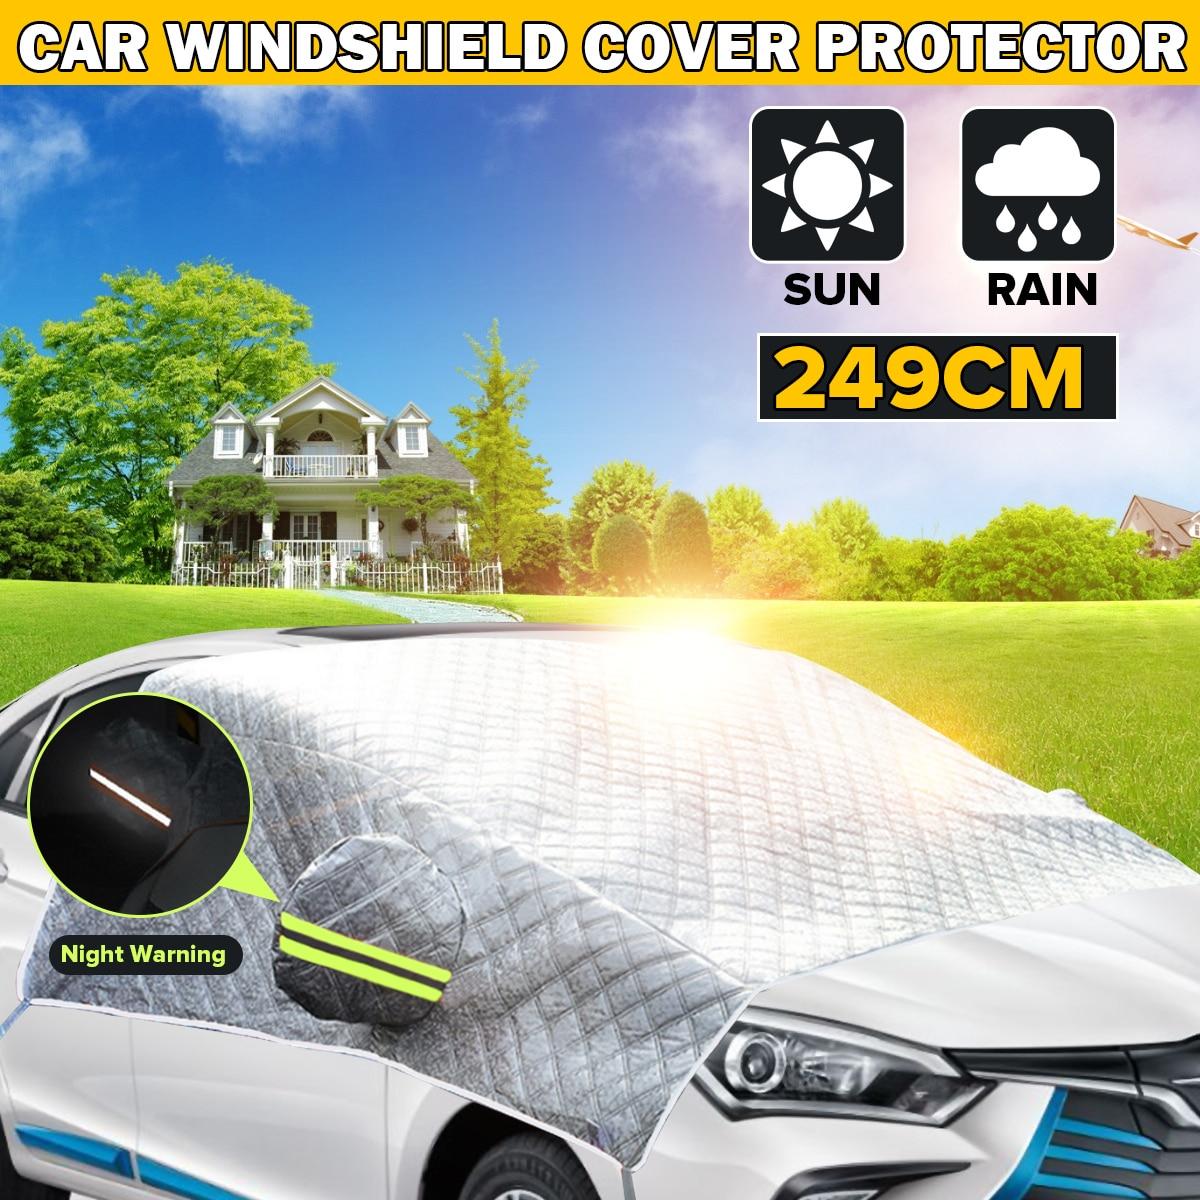 Protector Reflective-Bar-Cover Car-Windshield-Mirror Sun-Shade Aluminium-Film Winter